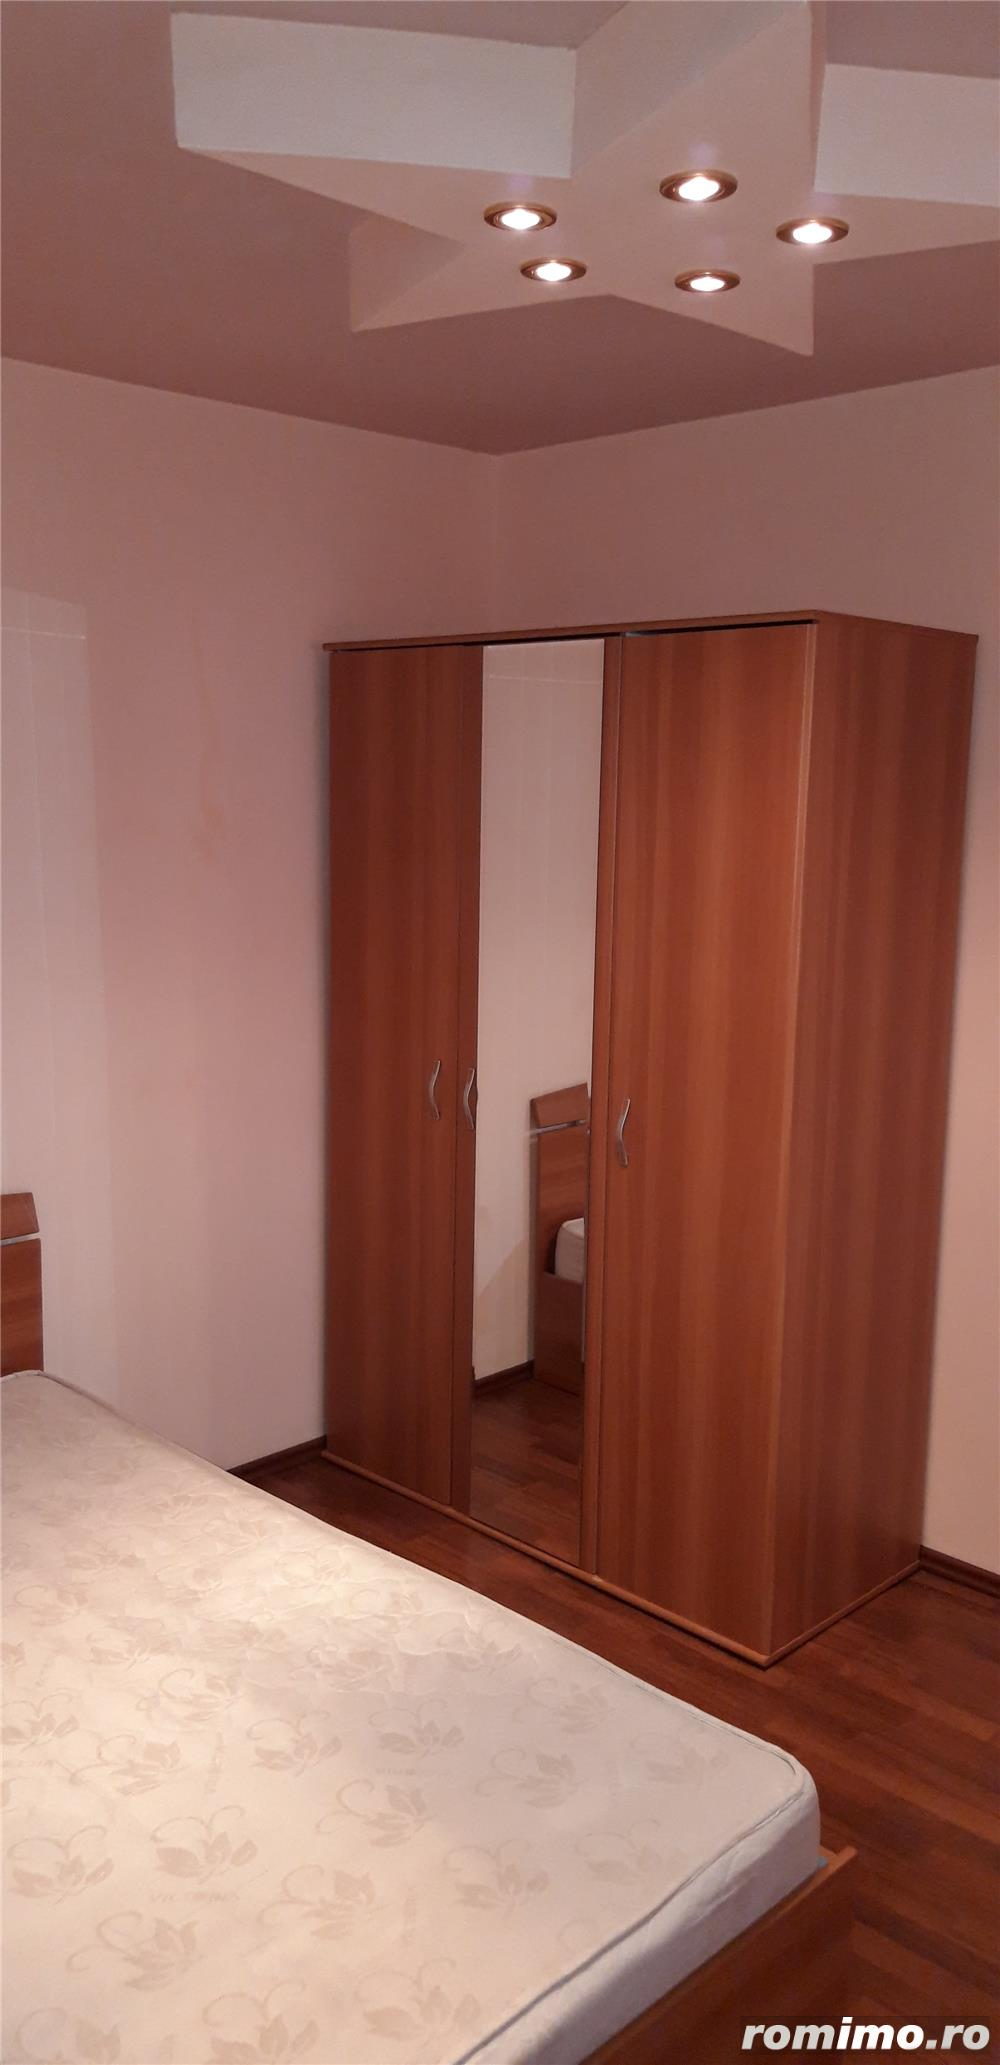 Apartament 3 camere, semidecomandat, Girocului, Piata